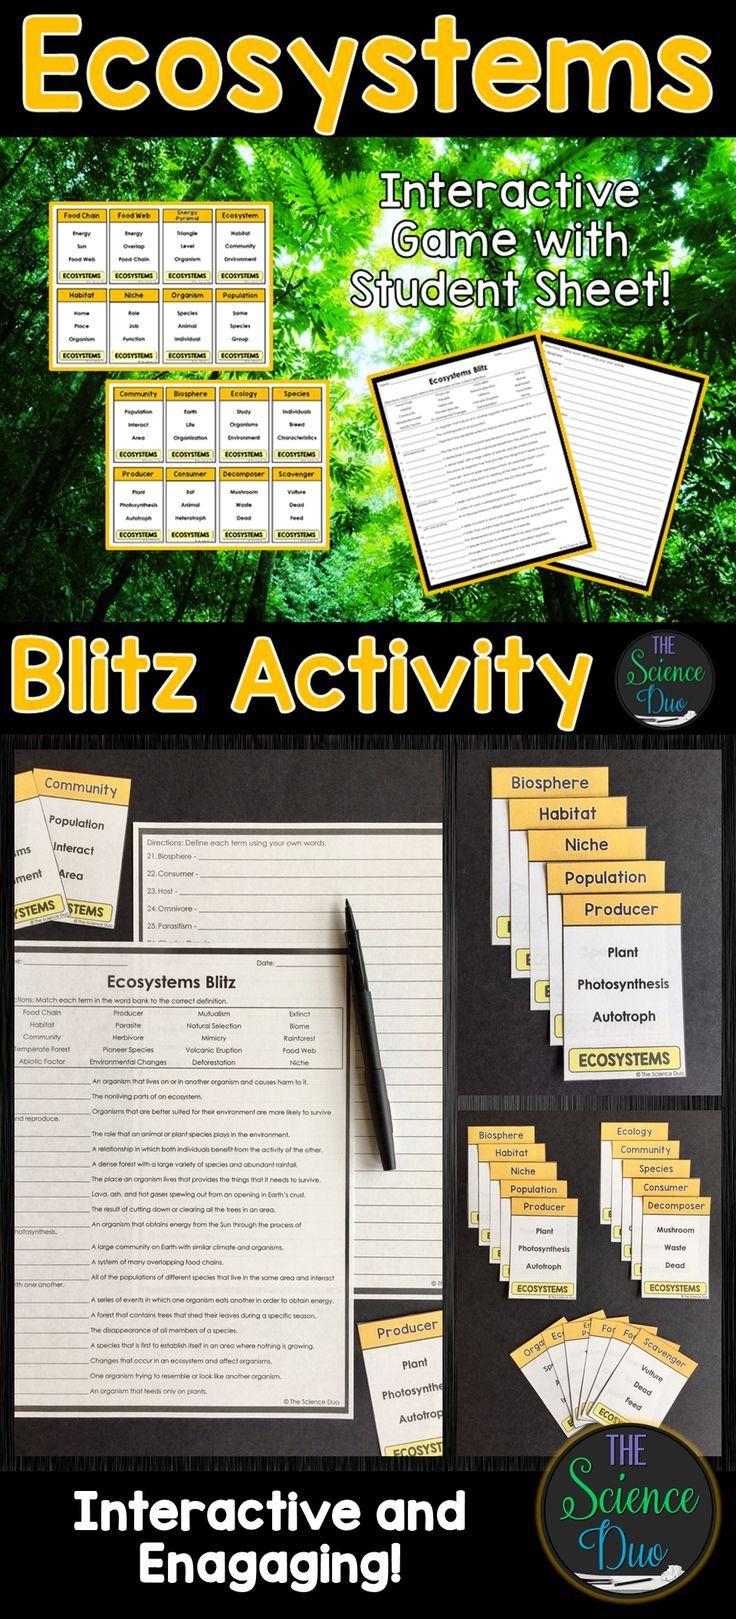 Ecosystems Blitz Activity Ecosystem activities, Teaching